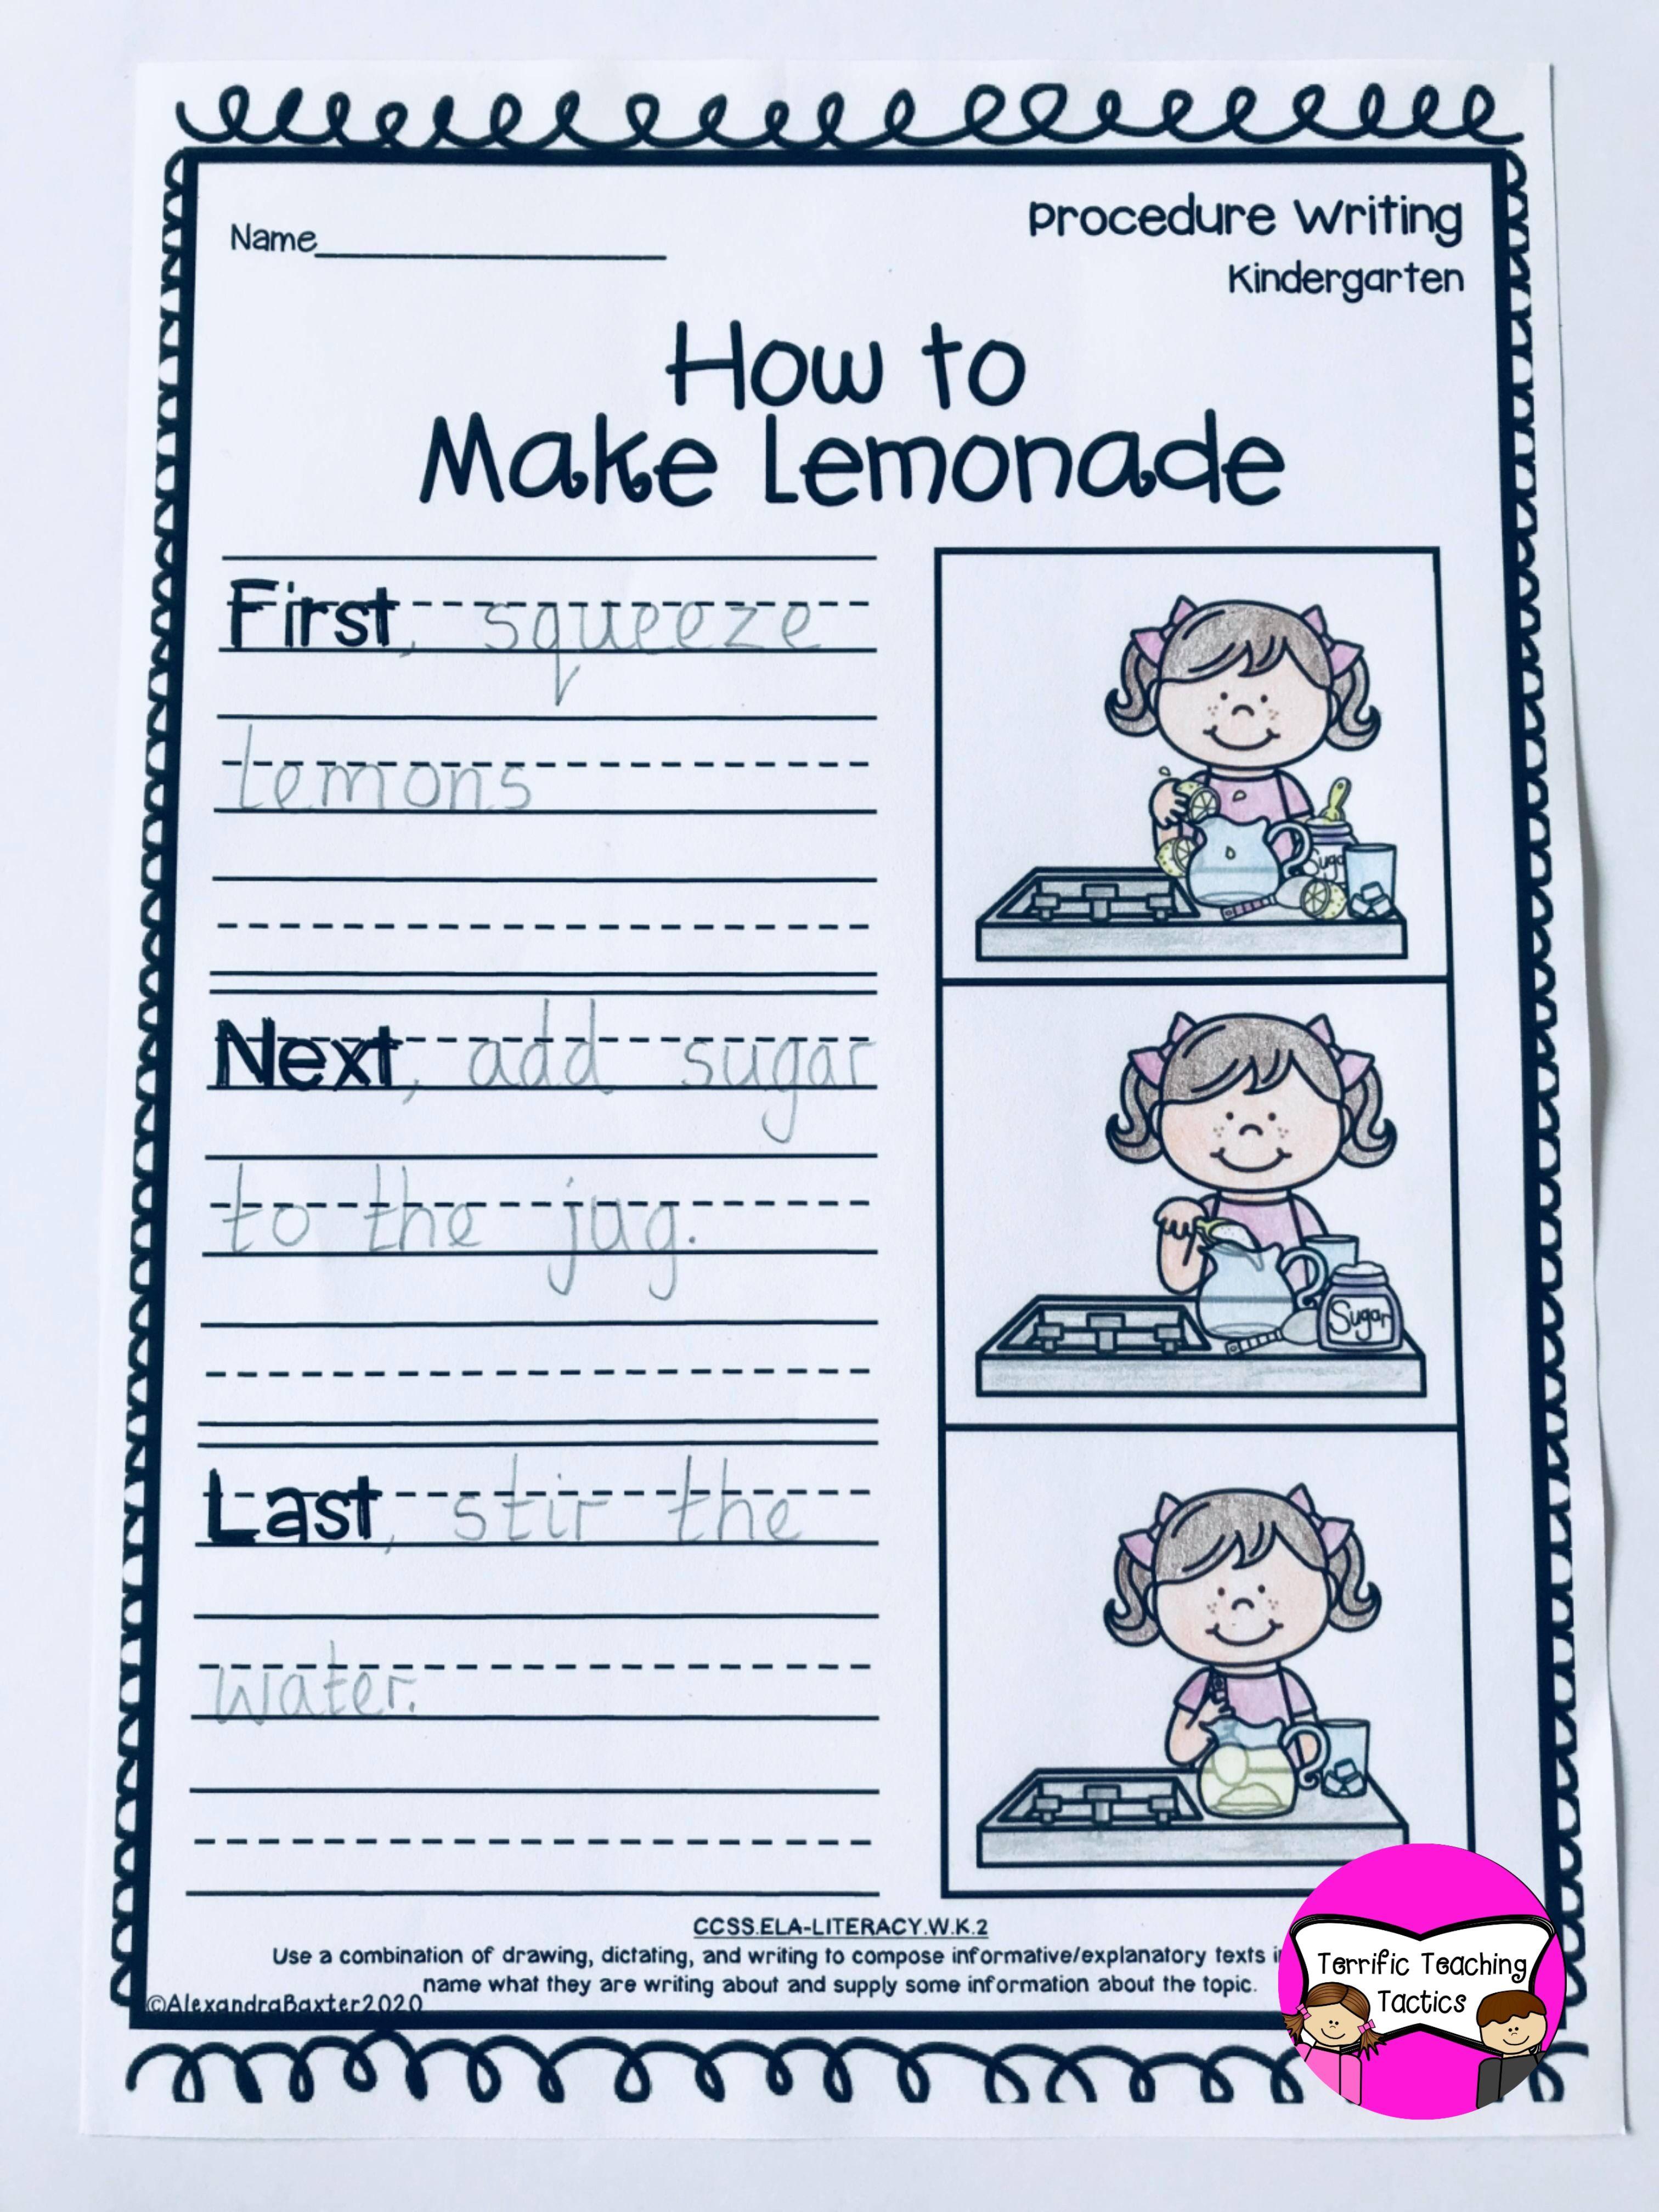 small resolution of How to Make Lemonade Worksheet   Procedural writing